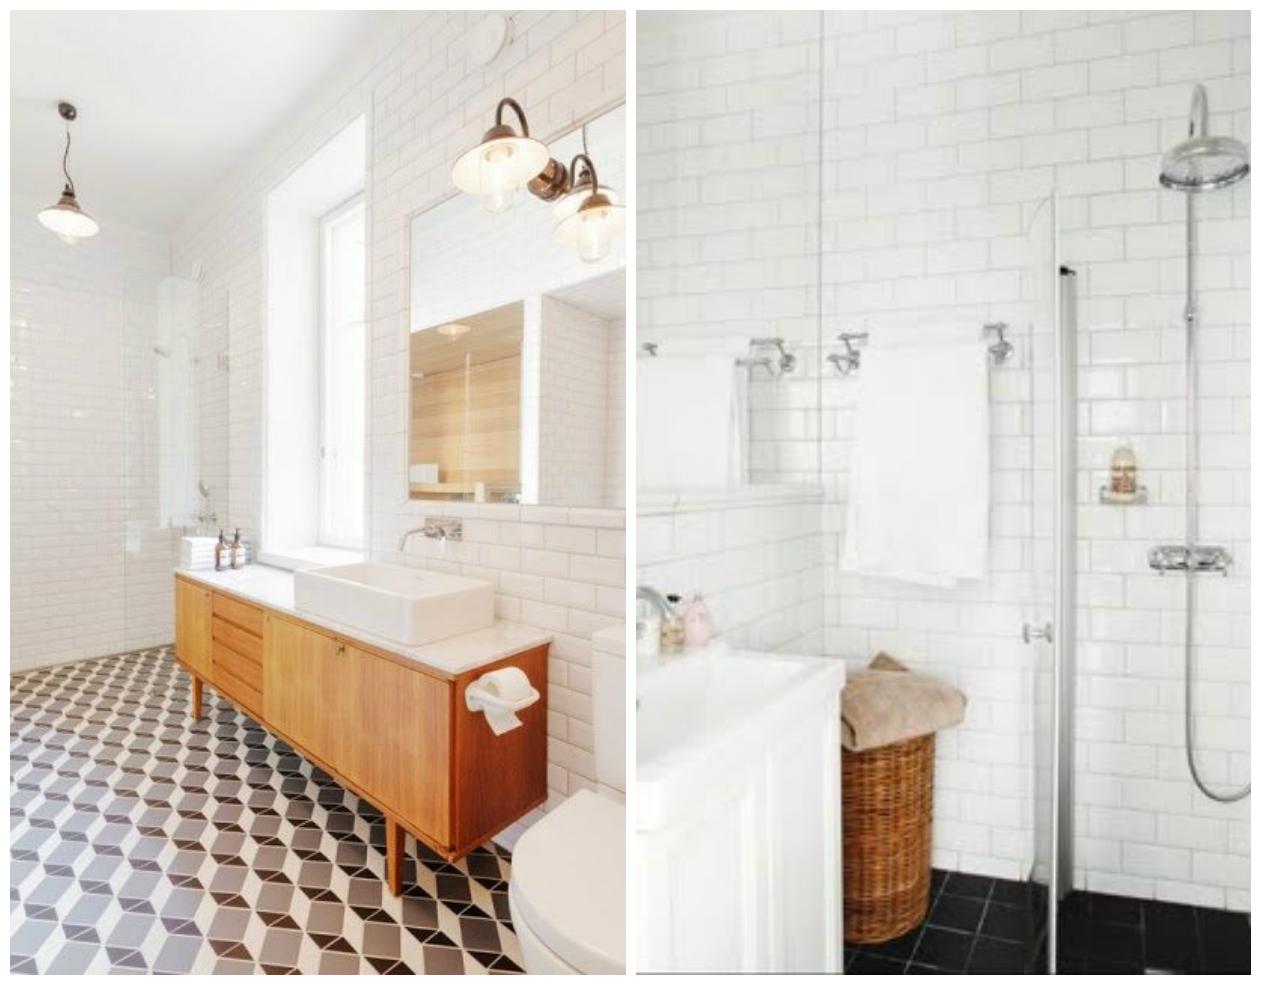 afbeeldingsresultaat voor badkamer metrotegel badkamer